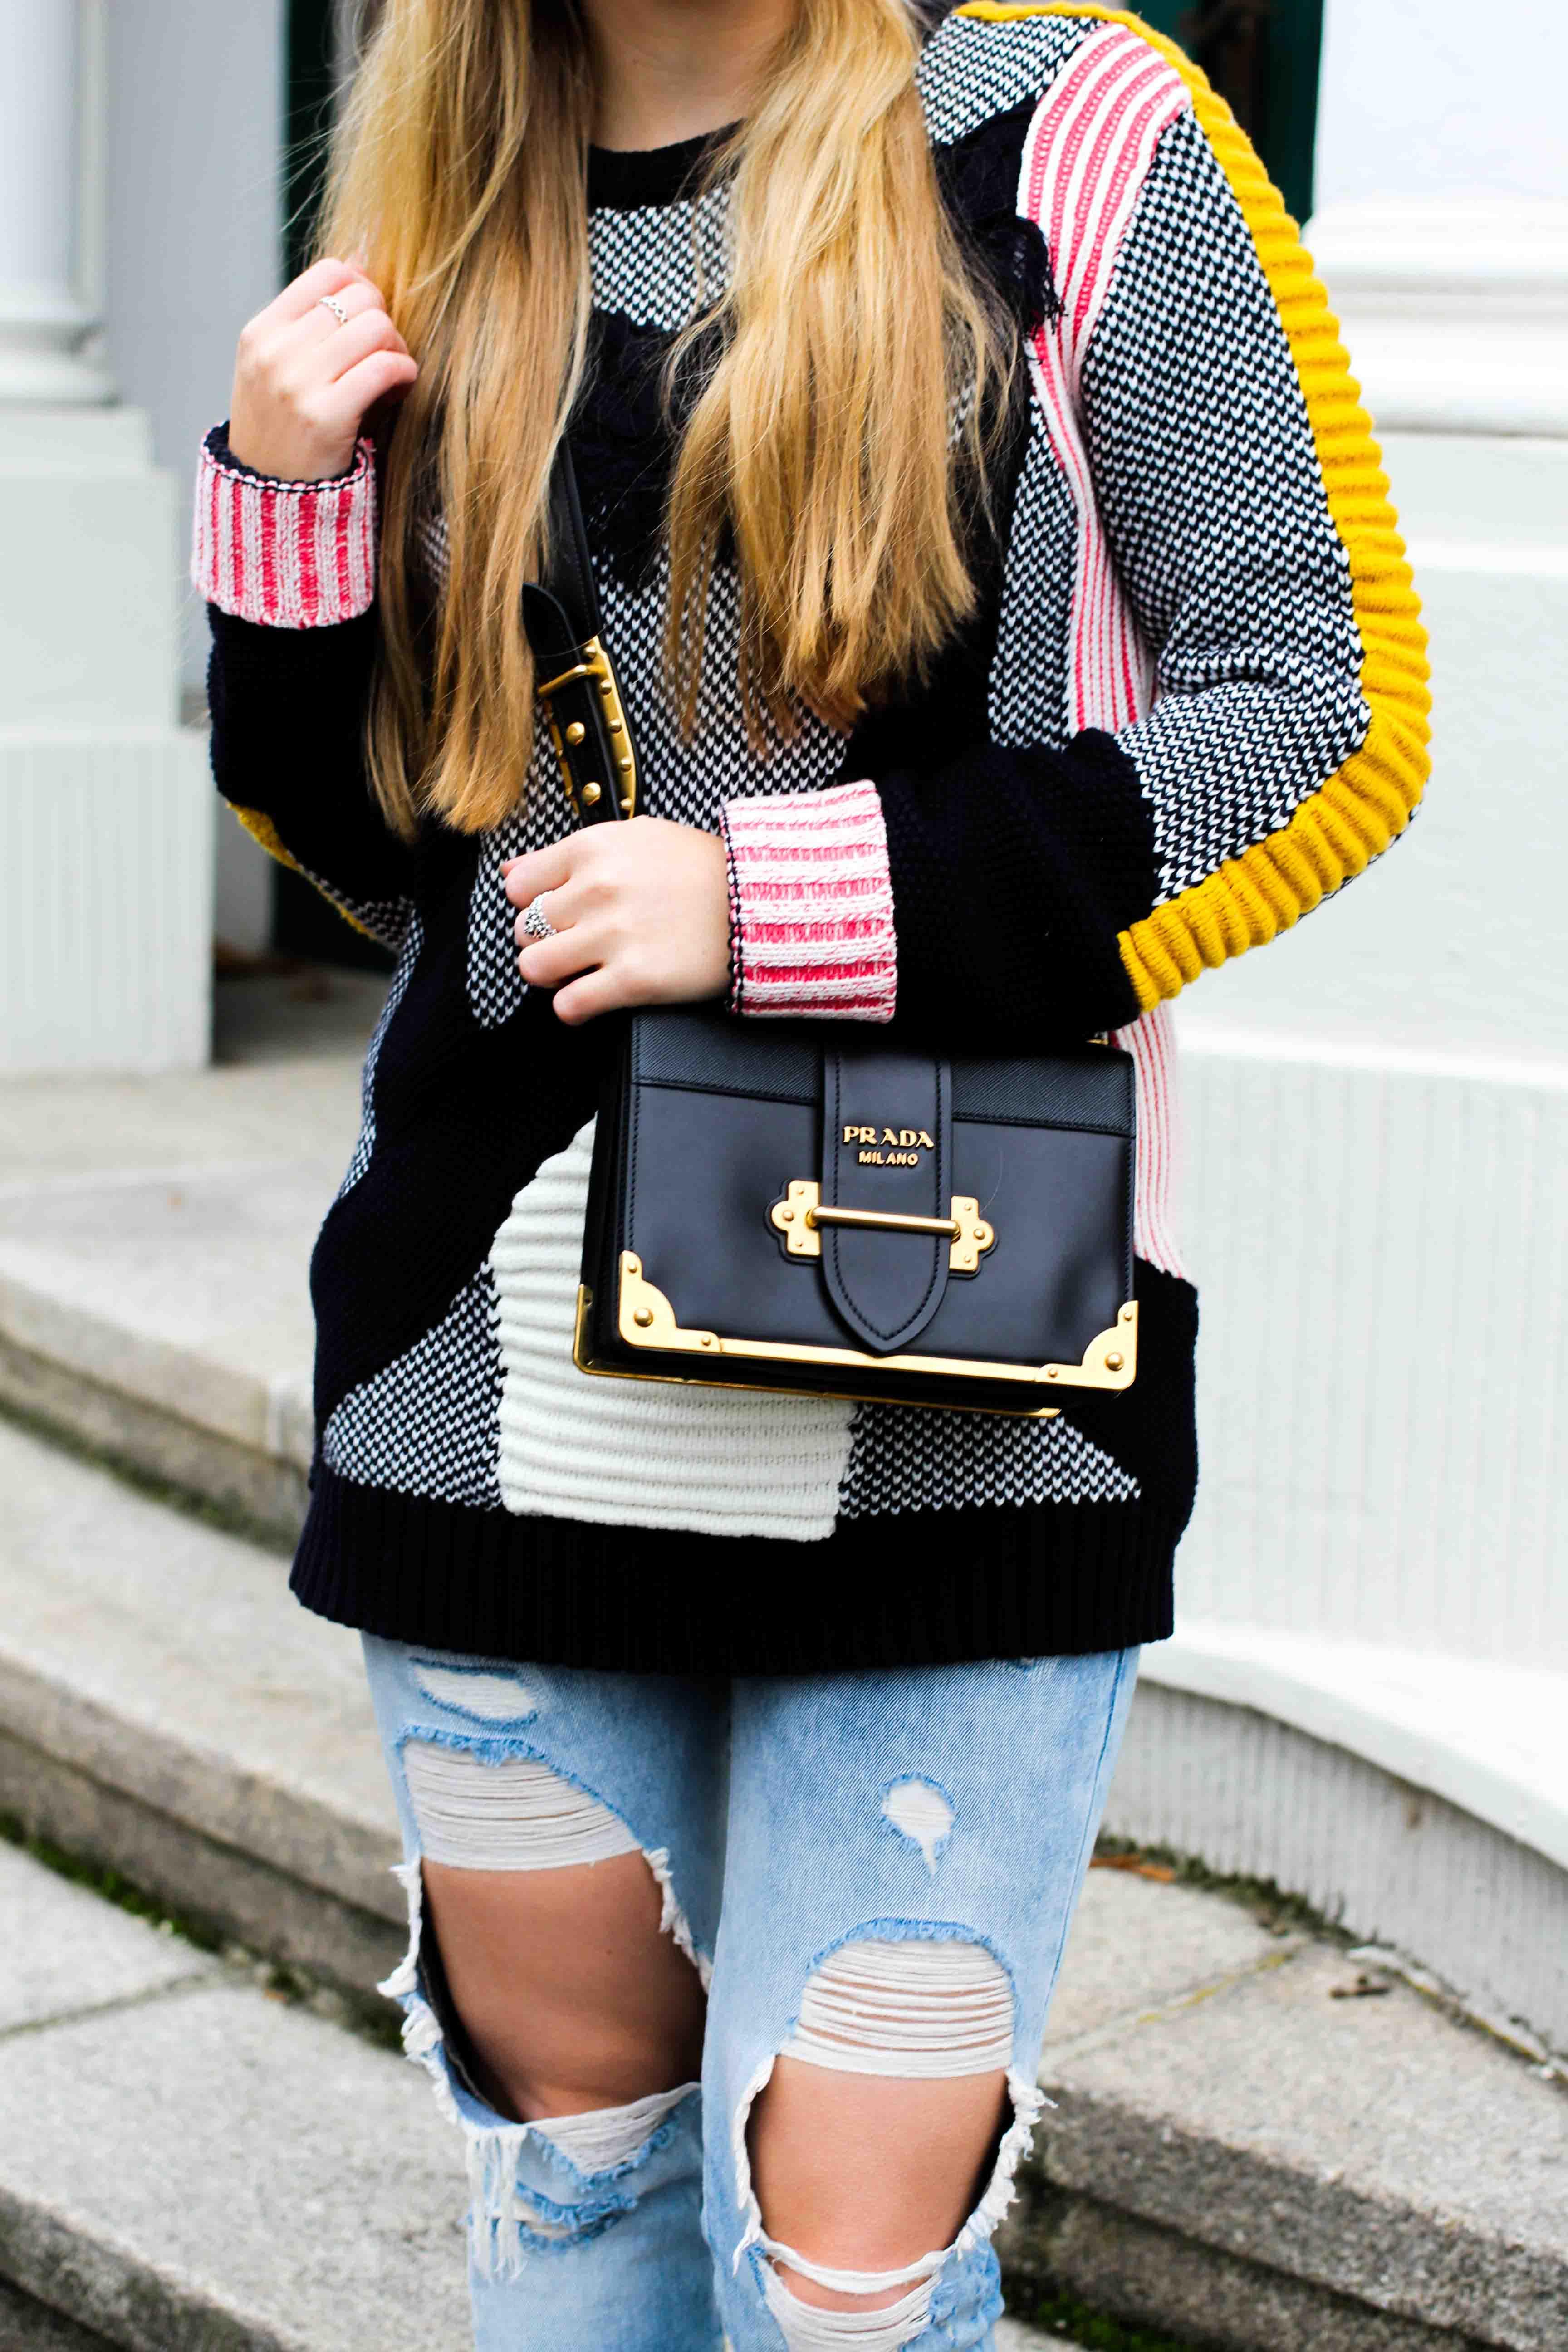 Streetstyle Bunter Wollpullover Asos Statementpullover Ripped Jeans Fashion Blog Prada Tasche 3